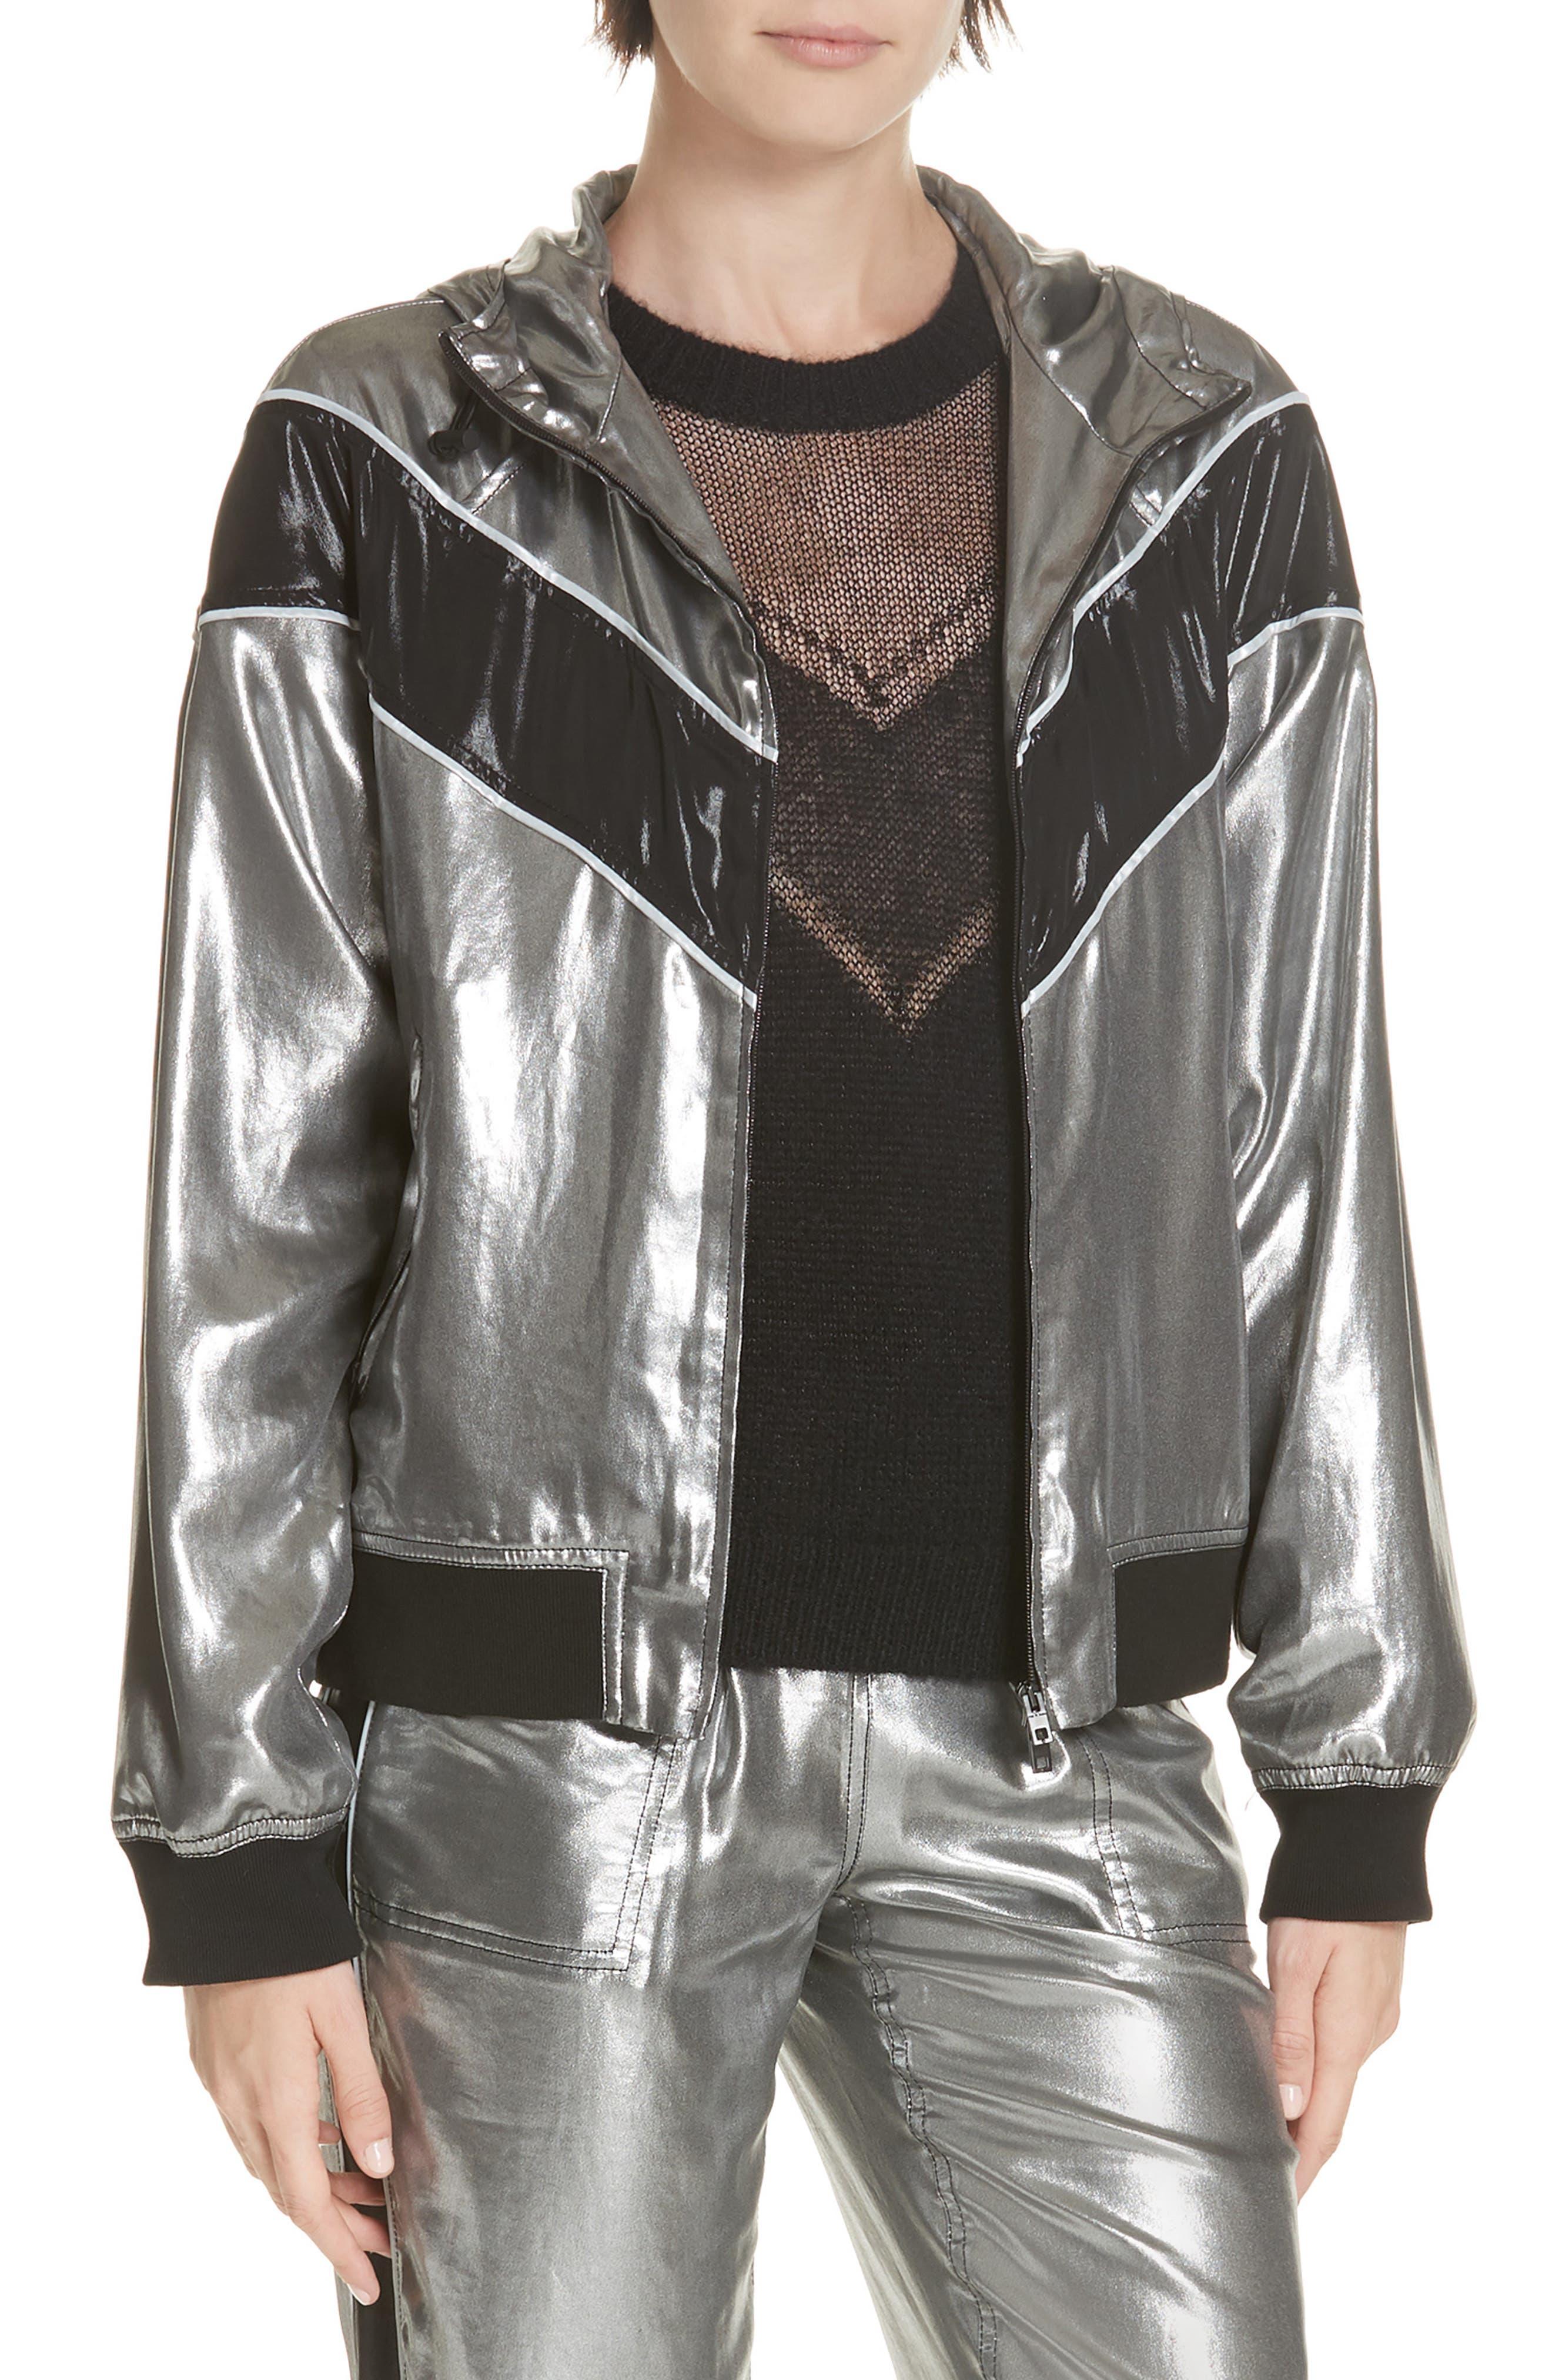 RAG & BONE,                             Sloane Metallic Track Jacket,                             Main thumbnail 1, color,                             SILVER/ BLACK